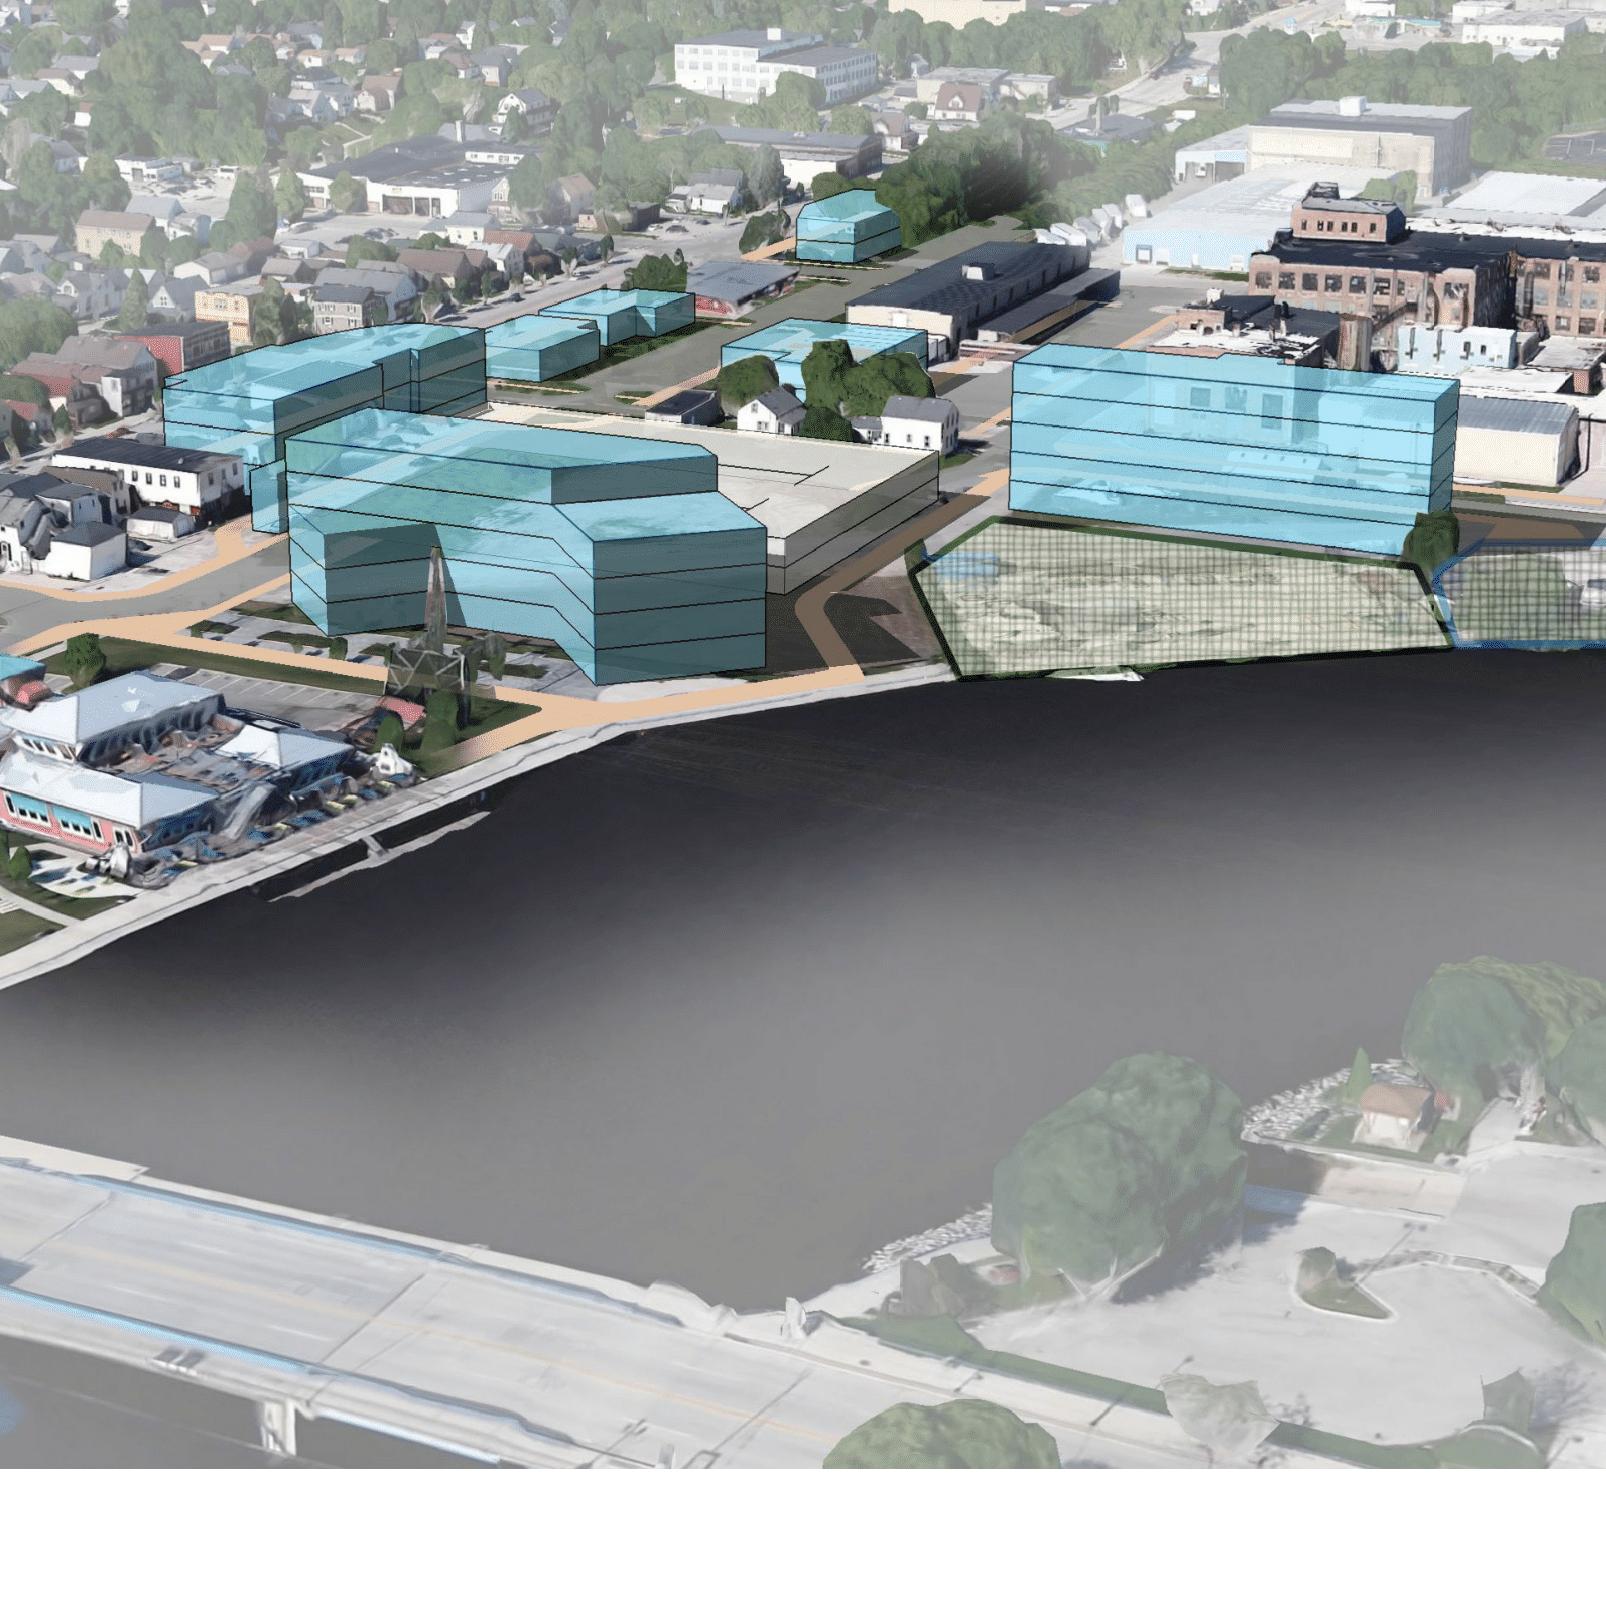 Sheboygan innovation district unveils new website | Streetwise